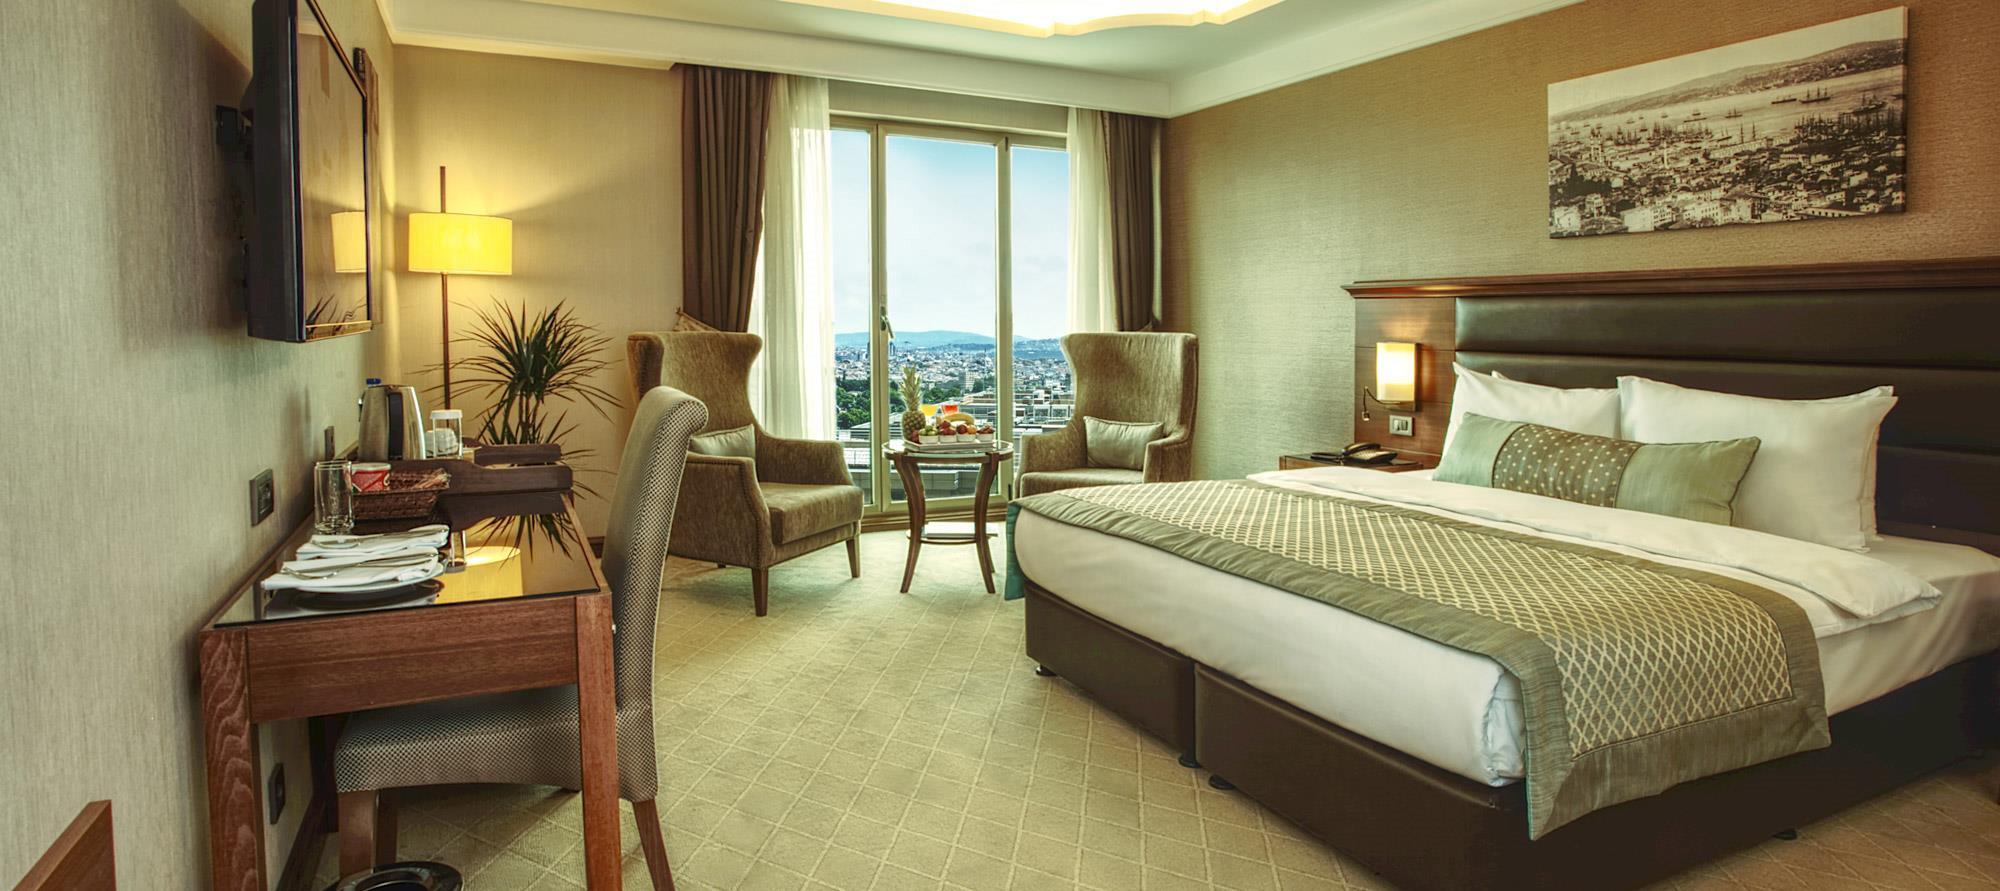 Grand Makel Hotel Topkapi254602